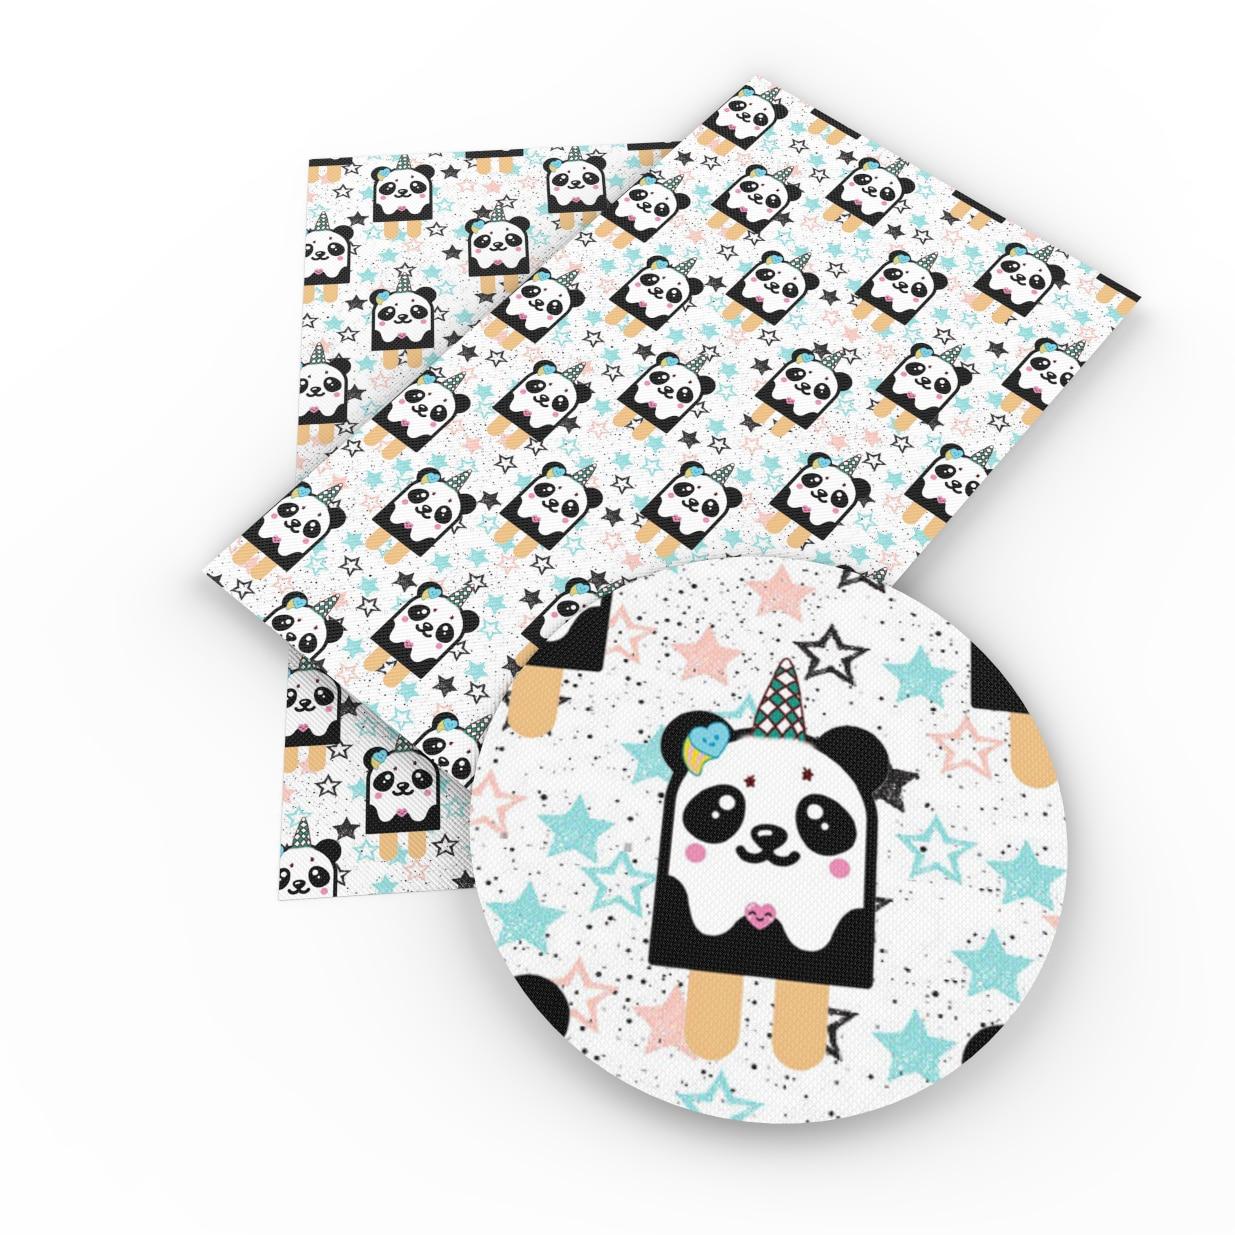 David acessórios 20*34 centímetros Tarja Panda Impresso Faux Tampa Do Telefone Carteira de Couro Sintético Para Sacos de Arco-nó scrapbook DIY, 1Yc4512